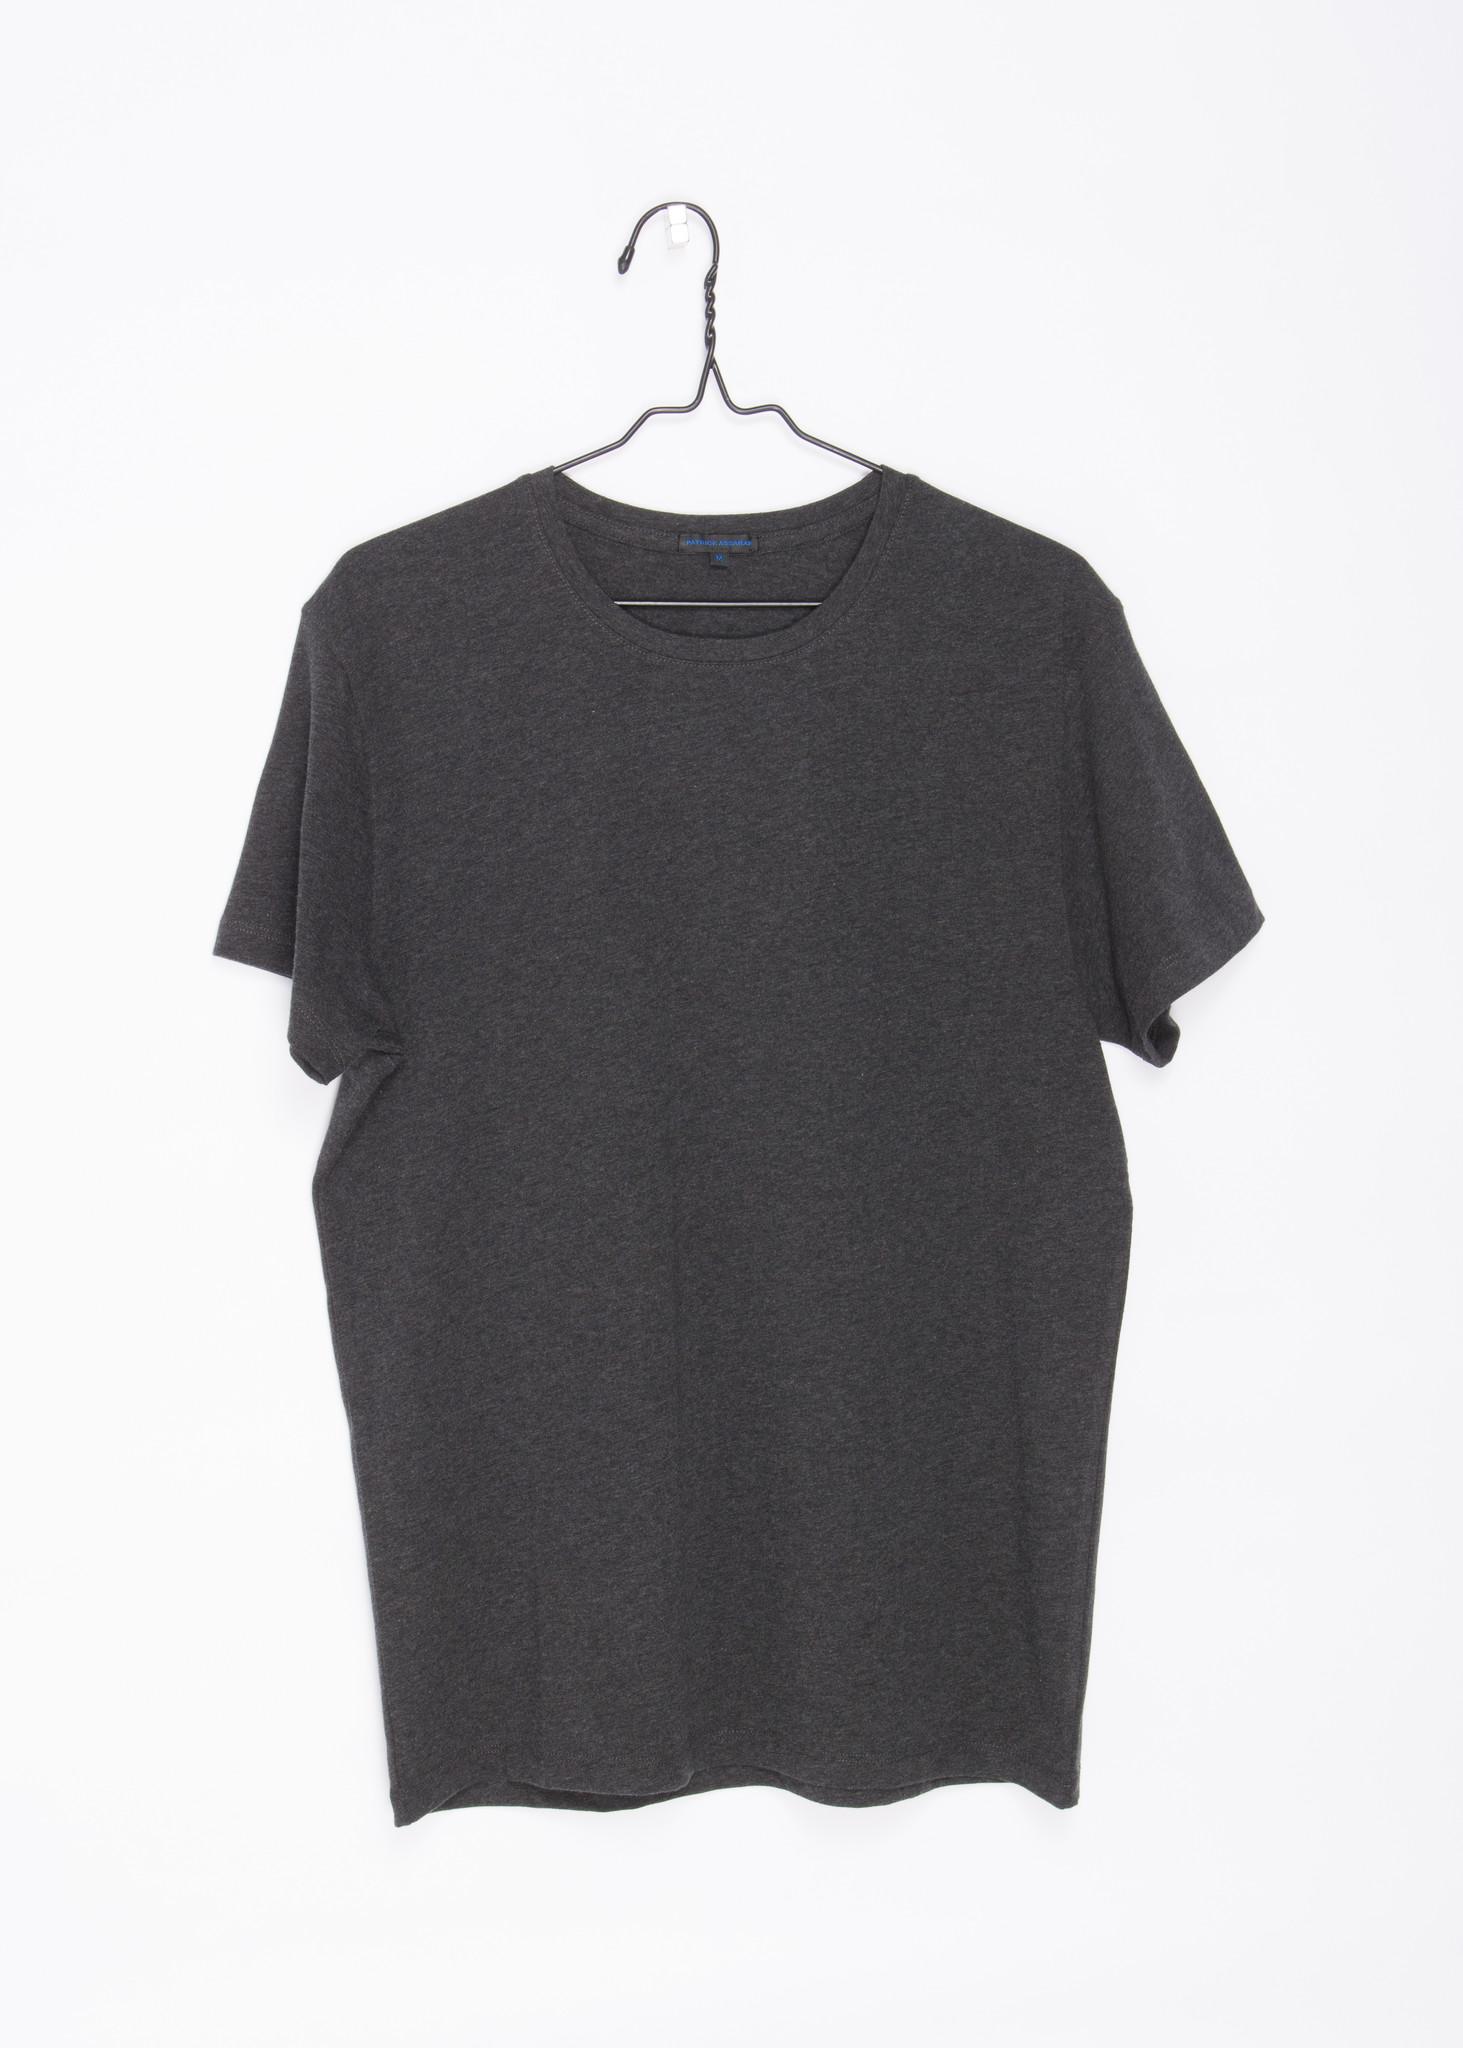 Charcoal Crew Neck T-shirt